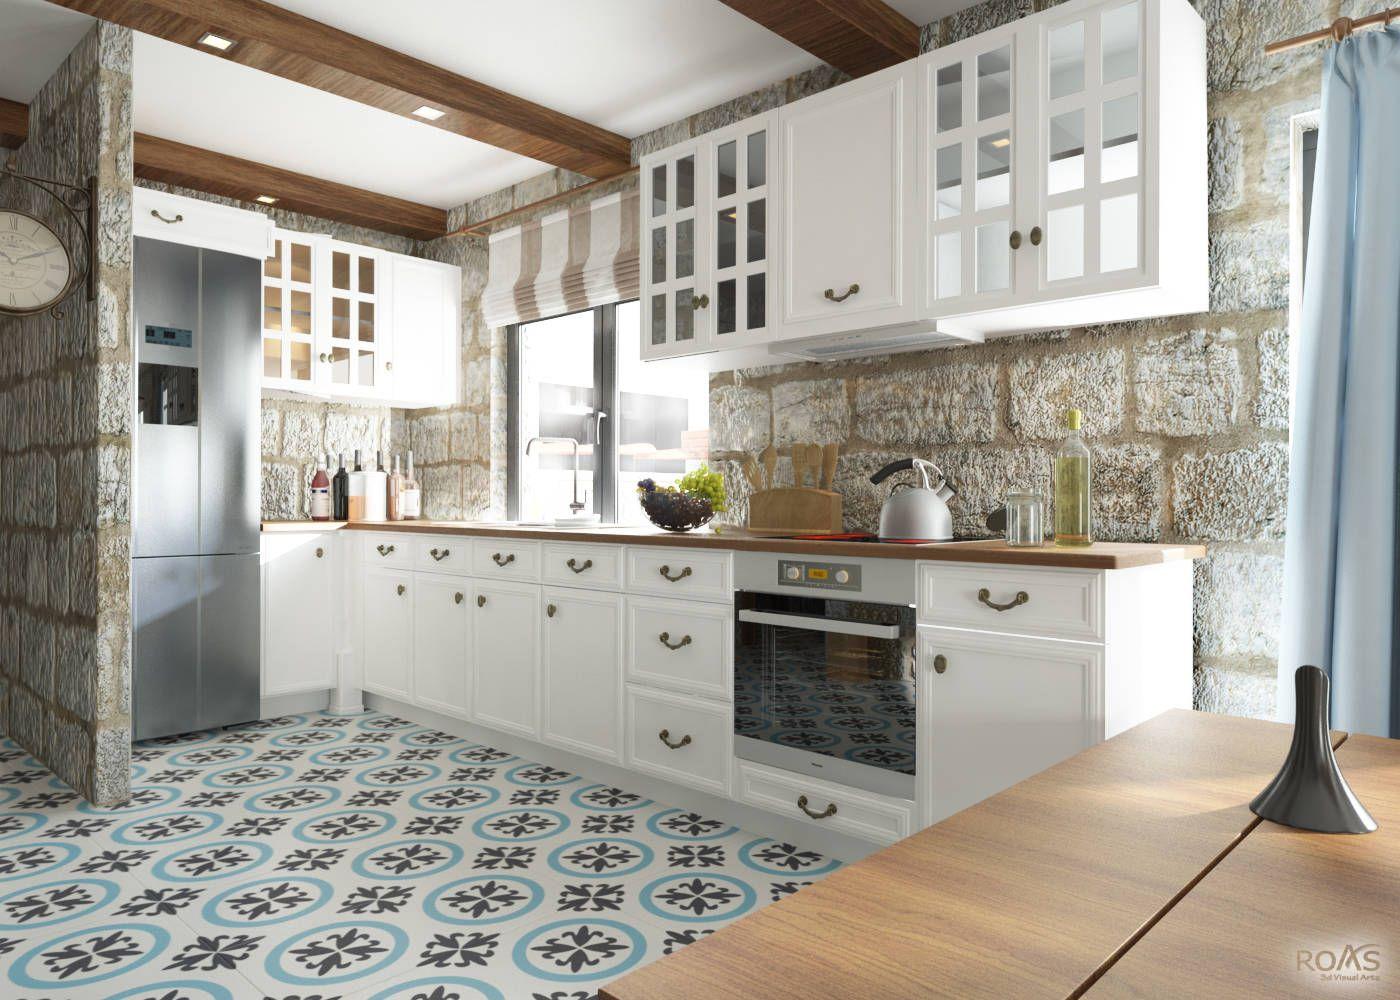 Fotos De Decoração Design De Interiores E Reformas  Kitchens And Magnificent 3D Design Kitchen Design Decoration